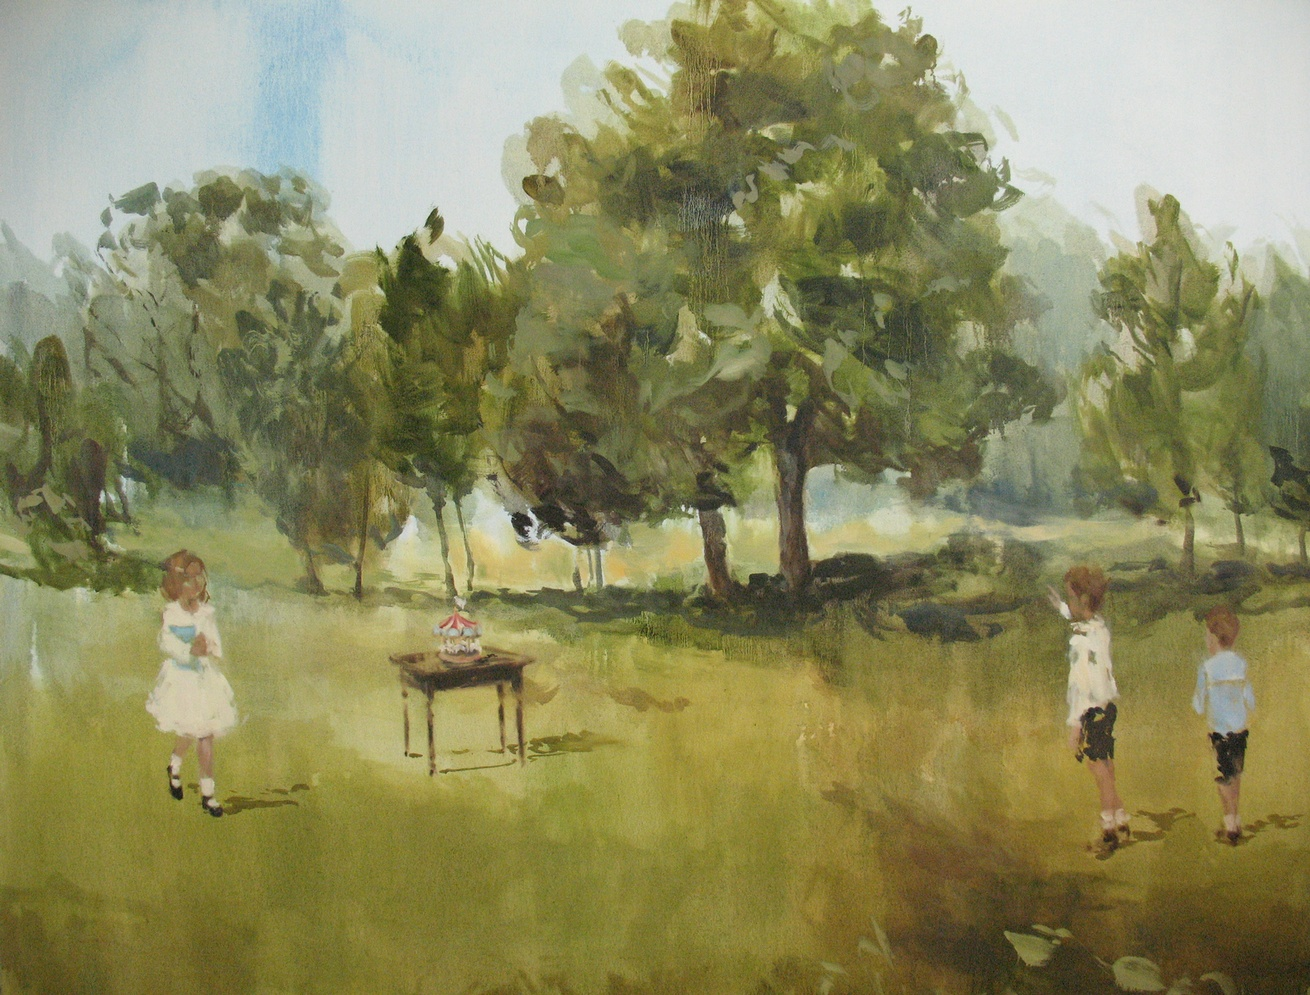 Velvet Carousel (precious few) 48 x 60 in. oil on canvas 2010